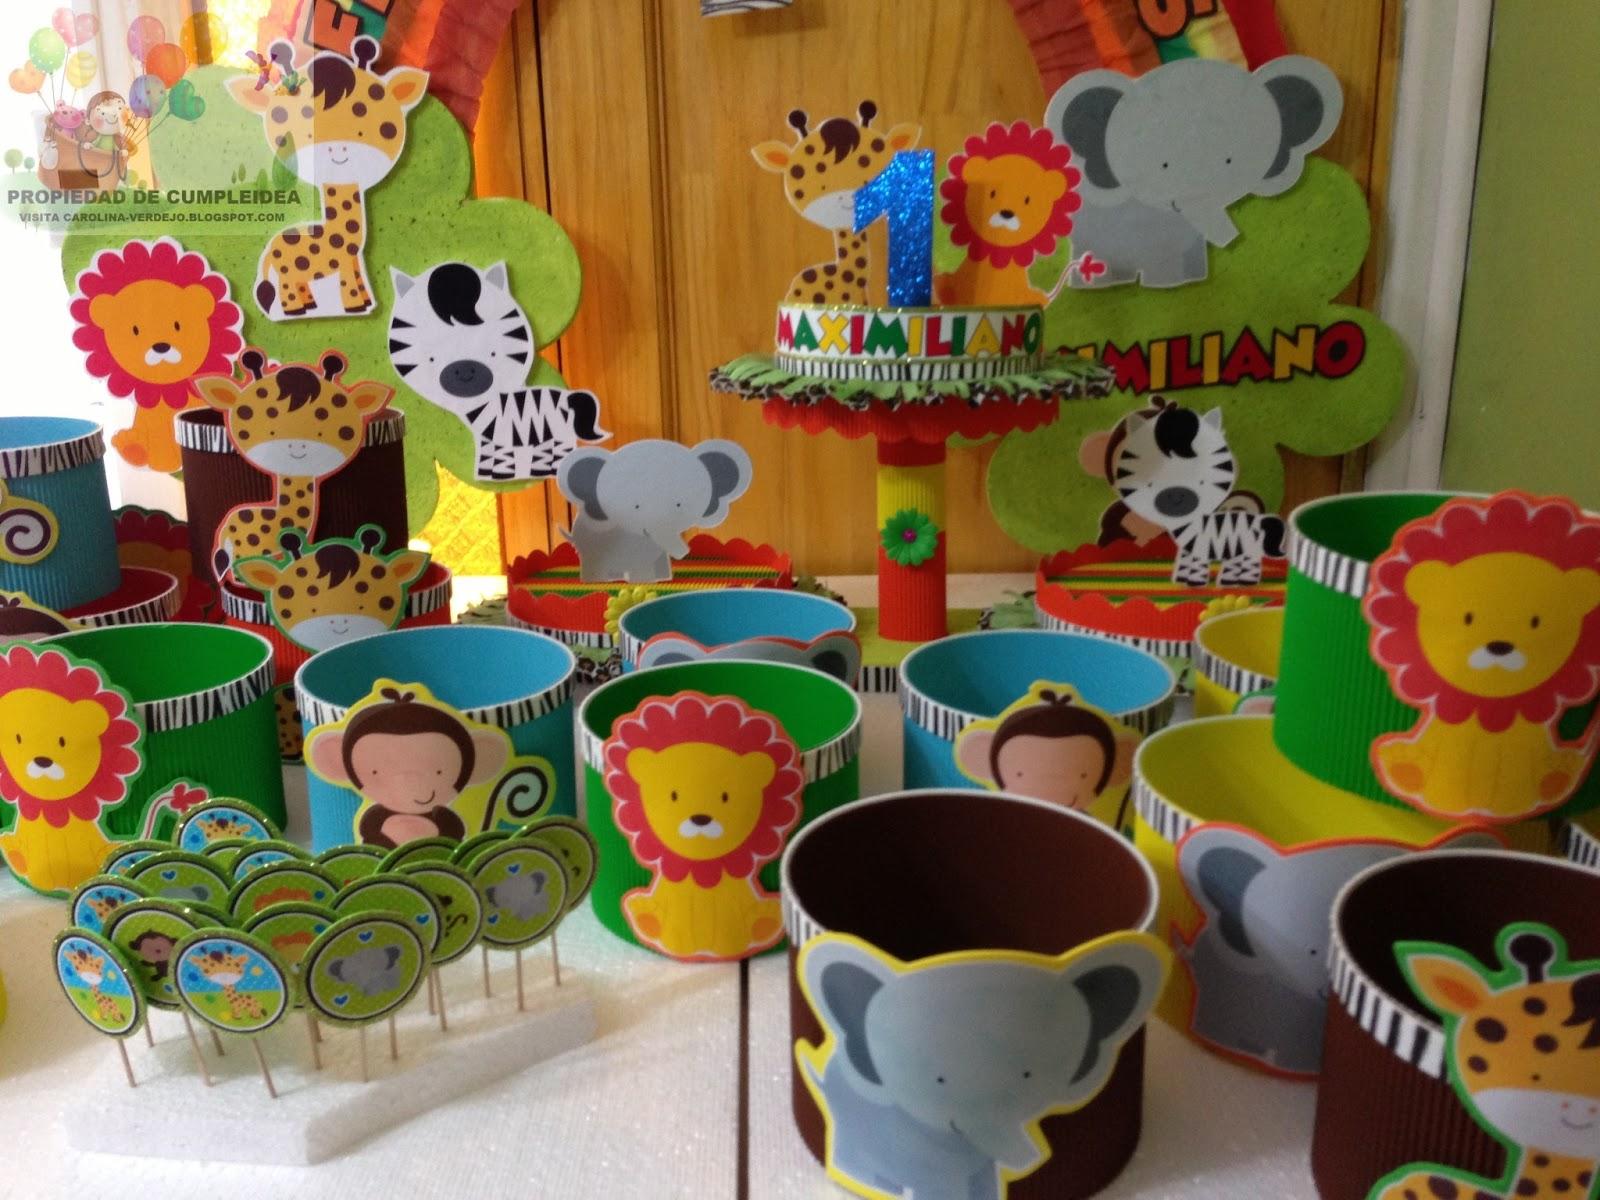 Decoraciones infantiles selva for Decoraciones infantiles